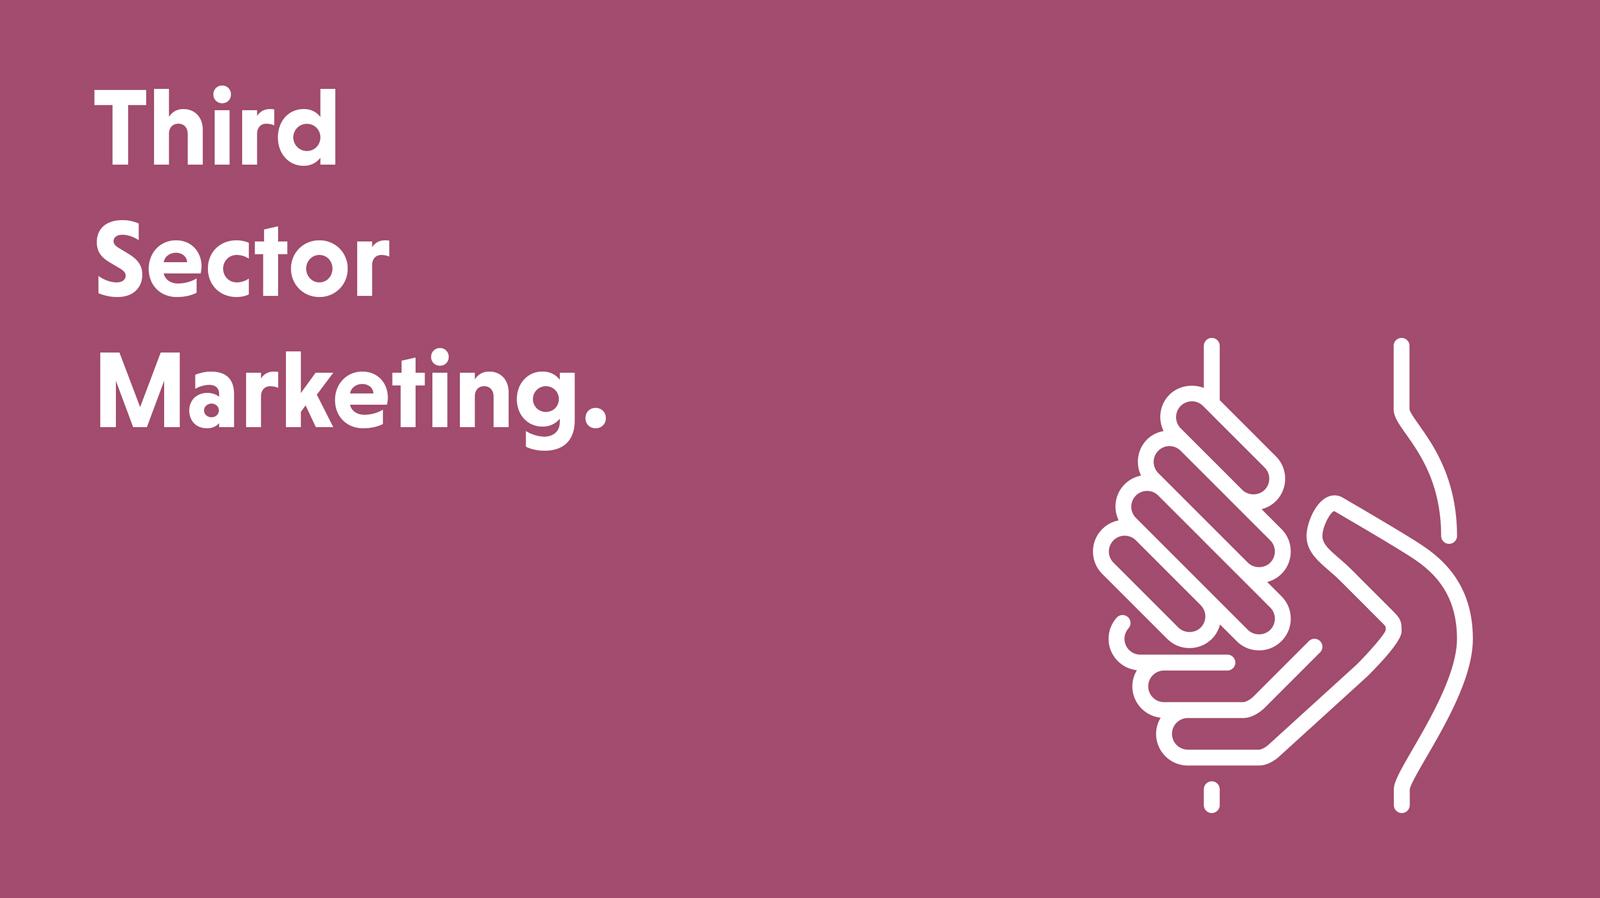 Strive Digital Glasgow UK Blog Cover for Third Sector Marketing